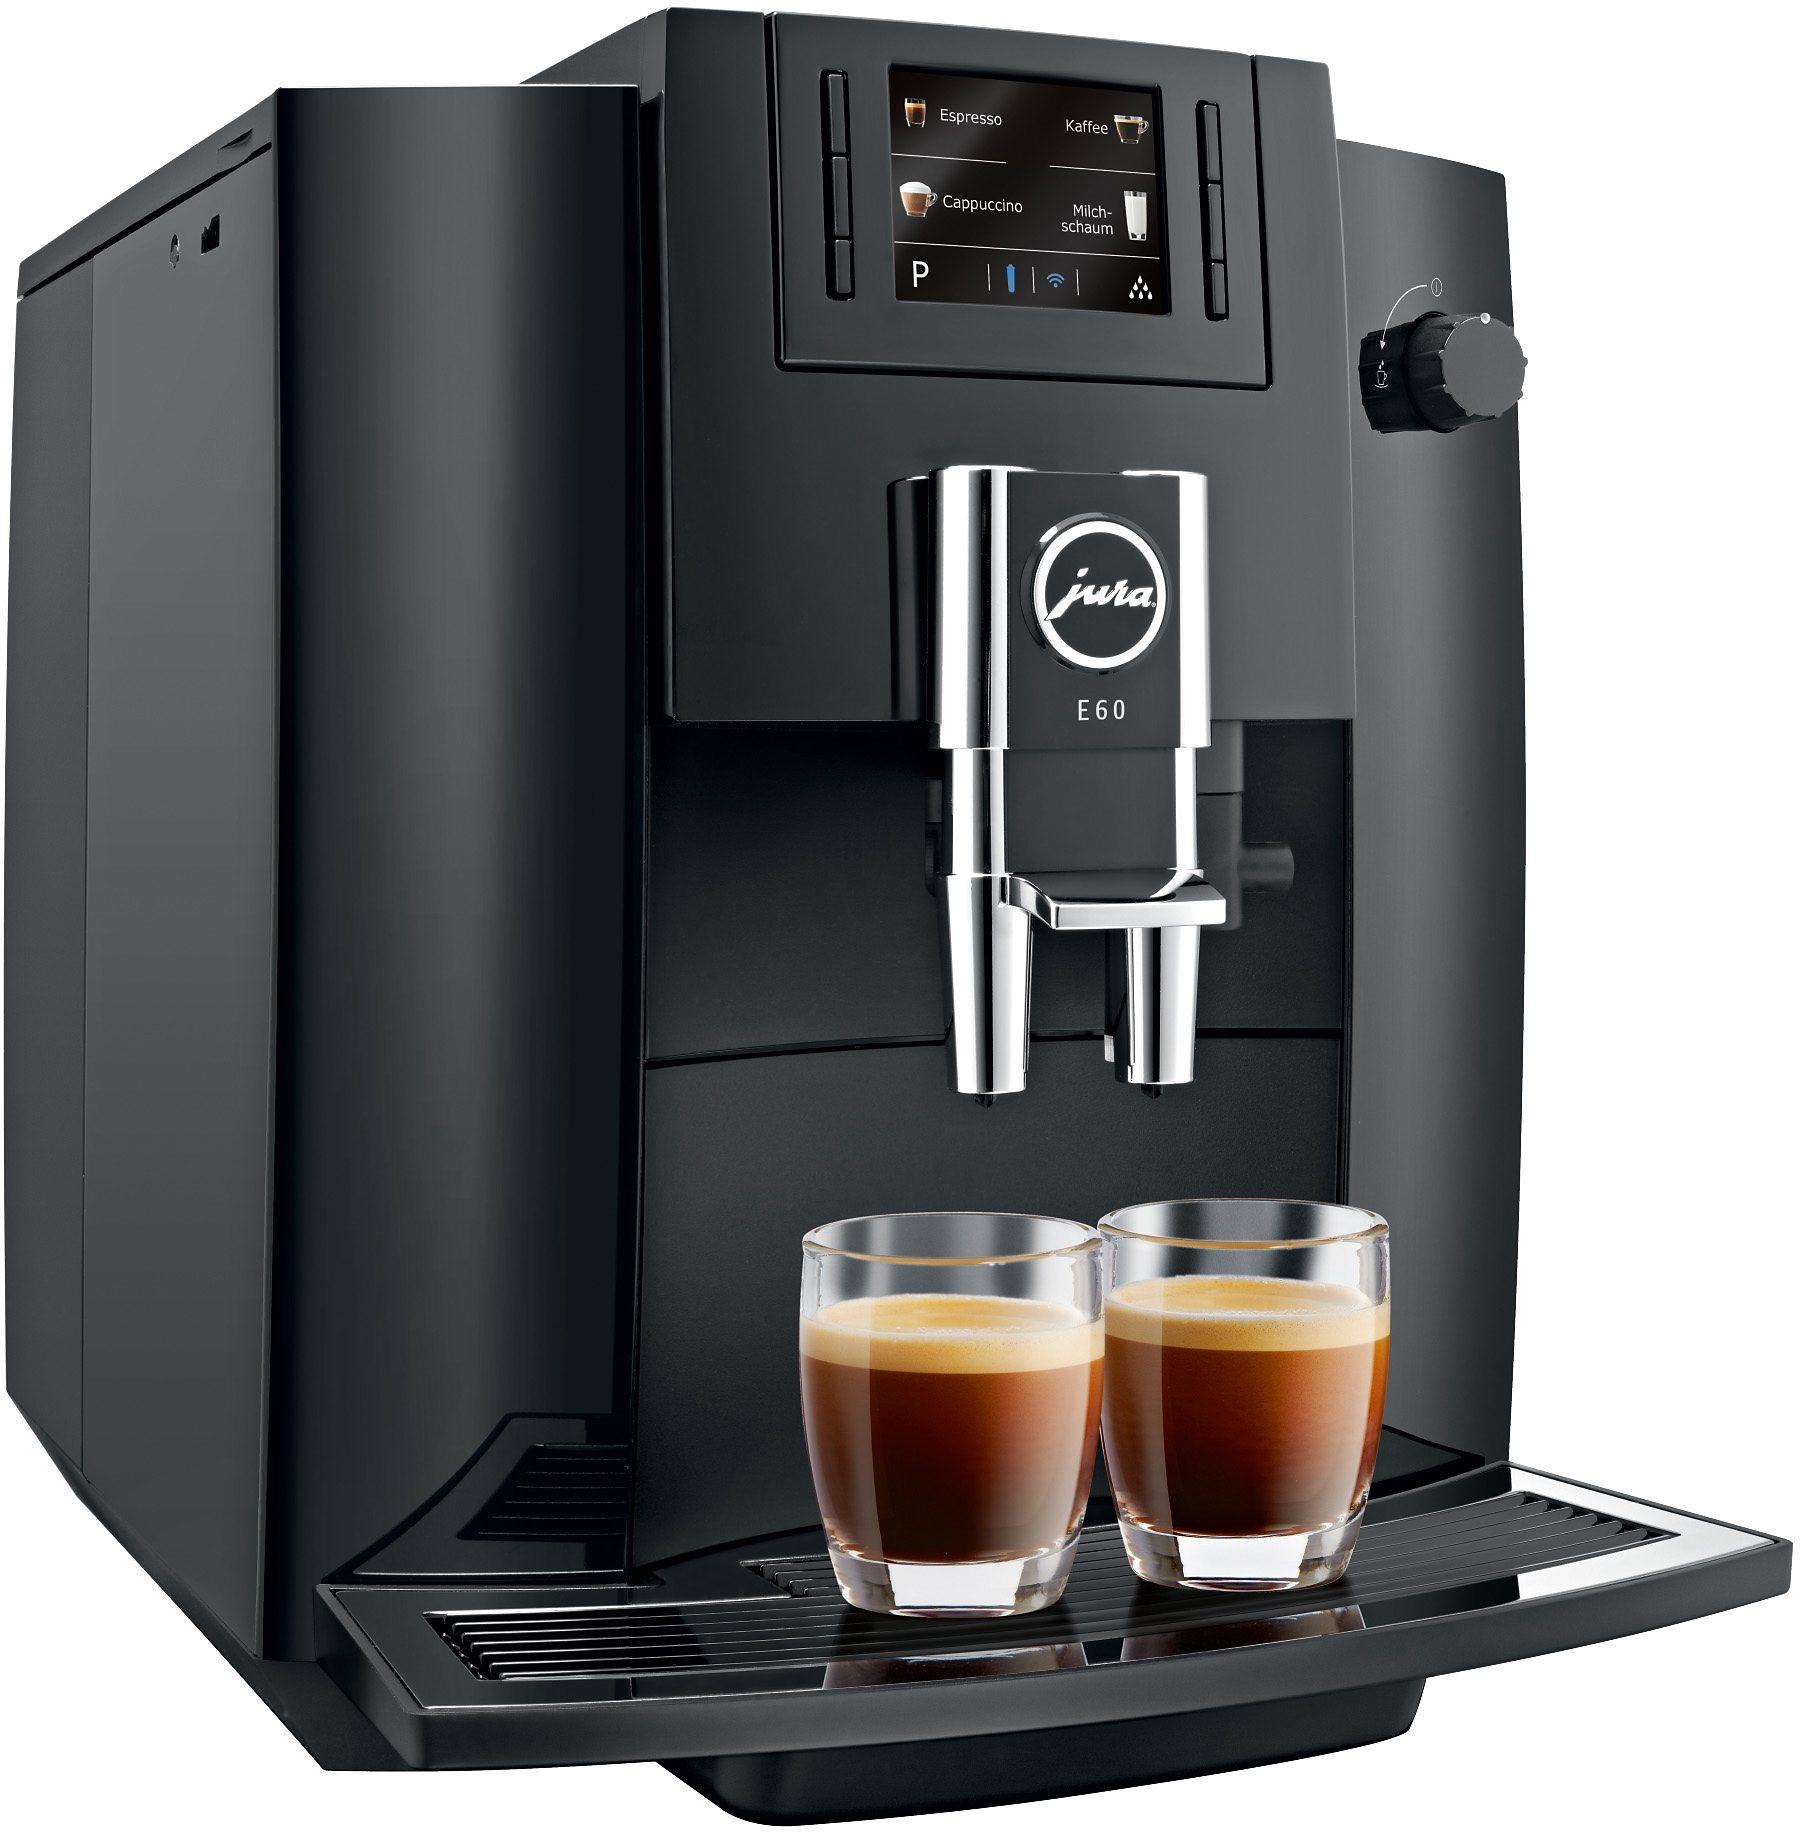 Jura Espresso-/Kaffee-Vollautomat E60